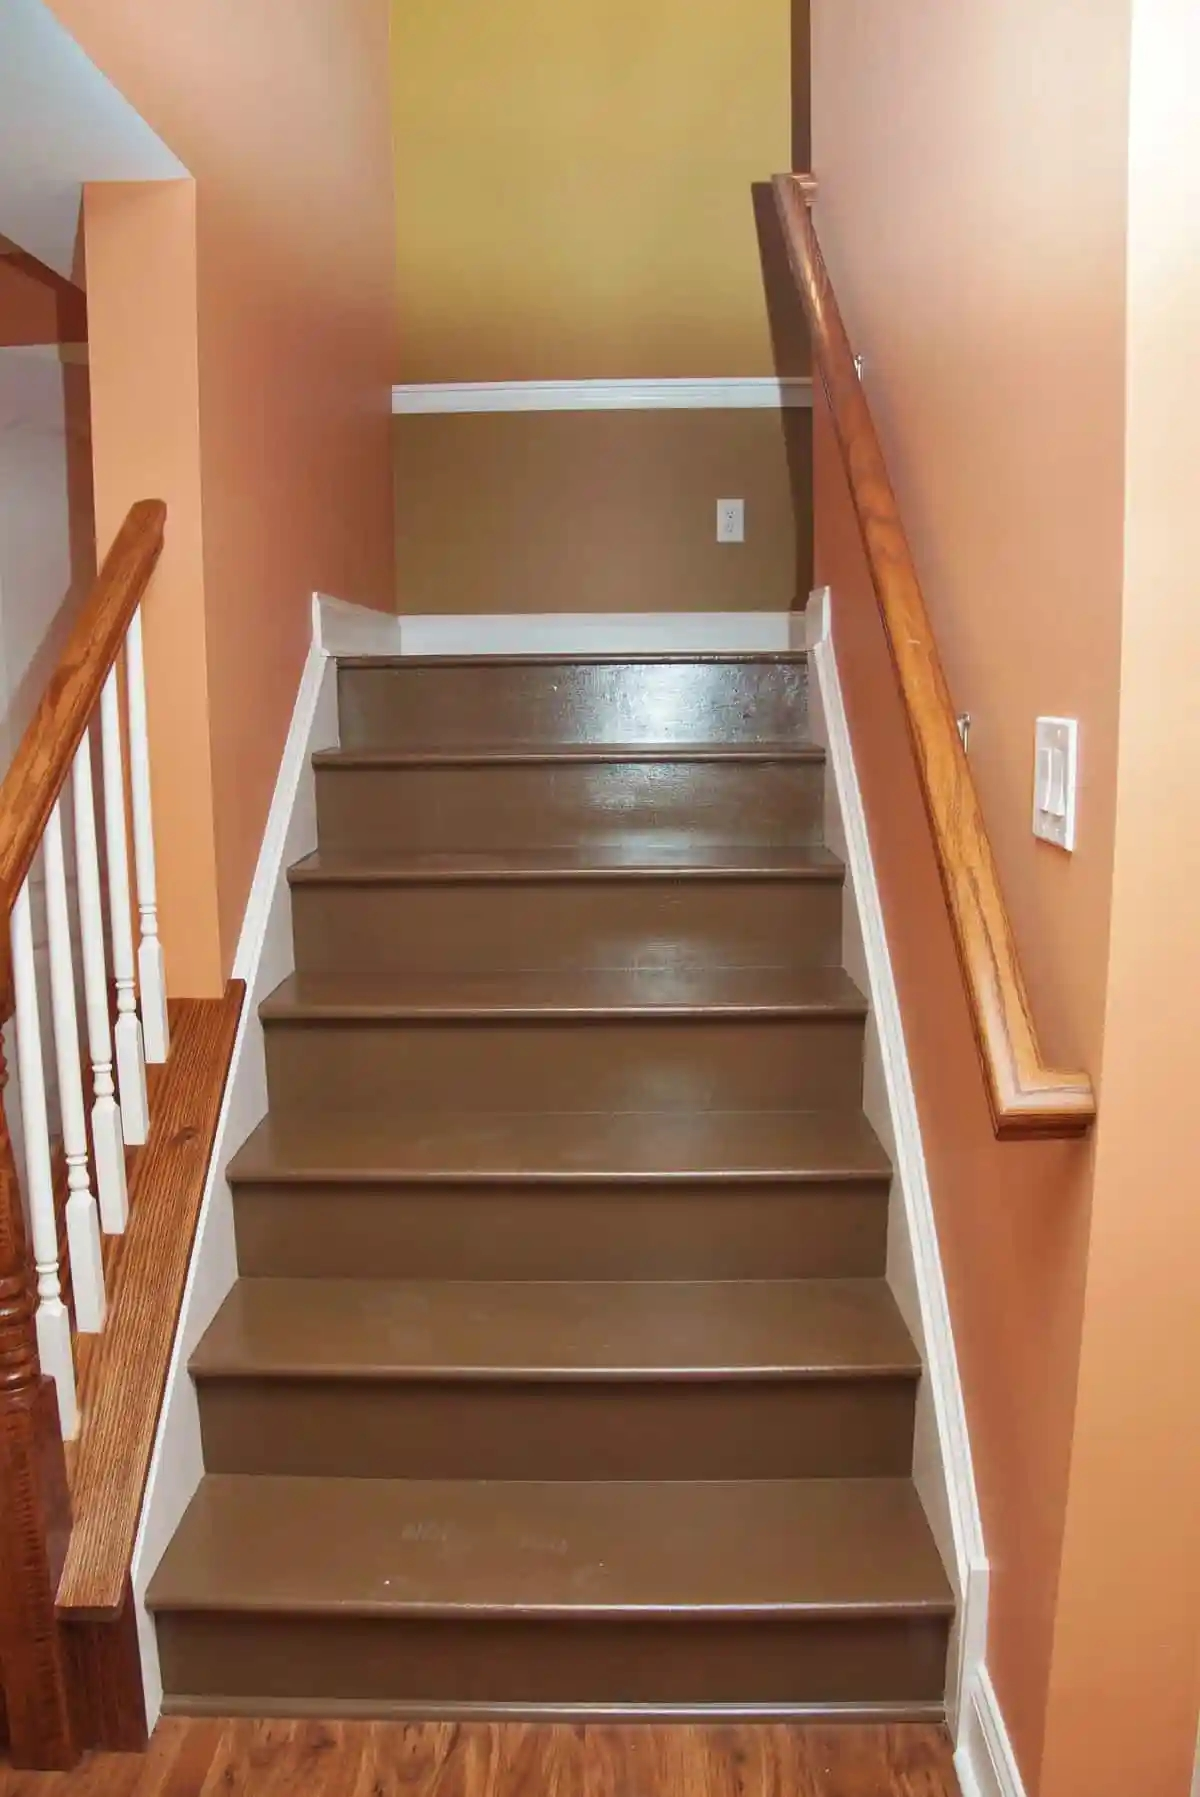 Stair Riser Stencil With Tuscan Tile Design   Stair Riser Tiles Designs